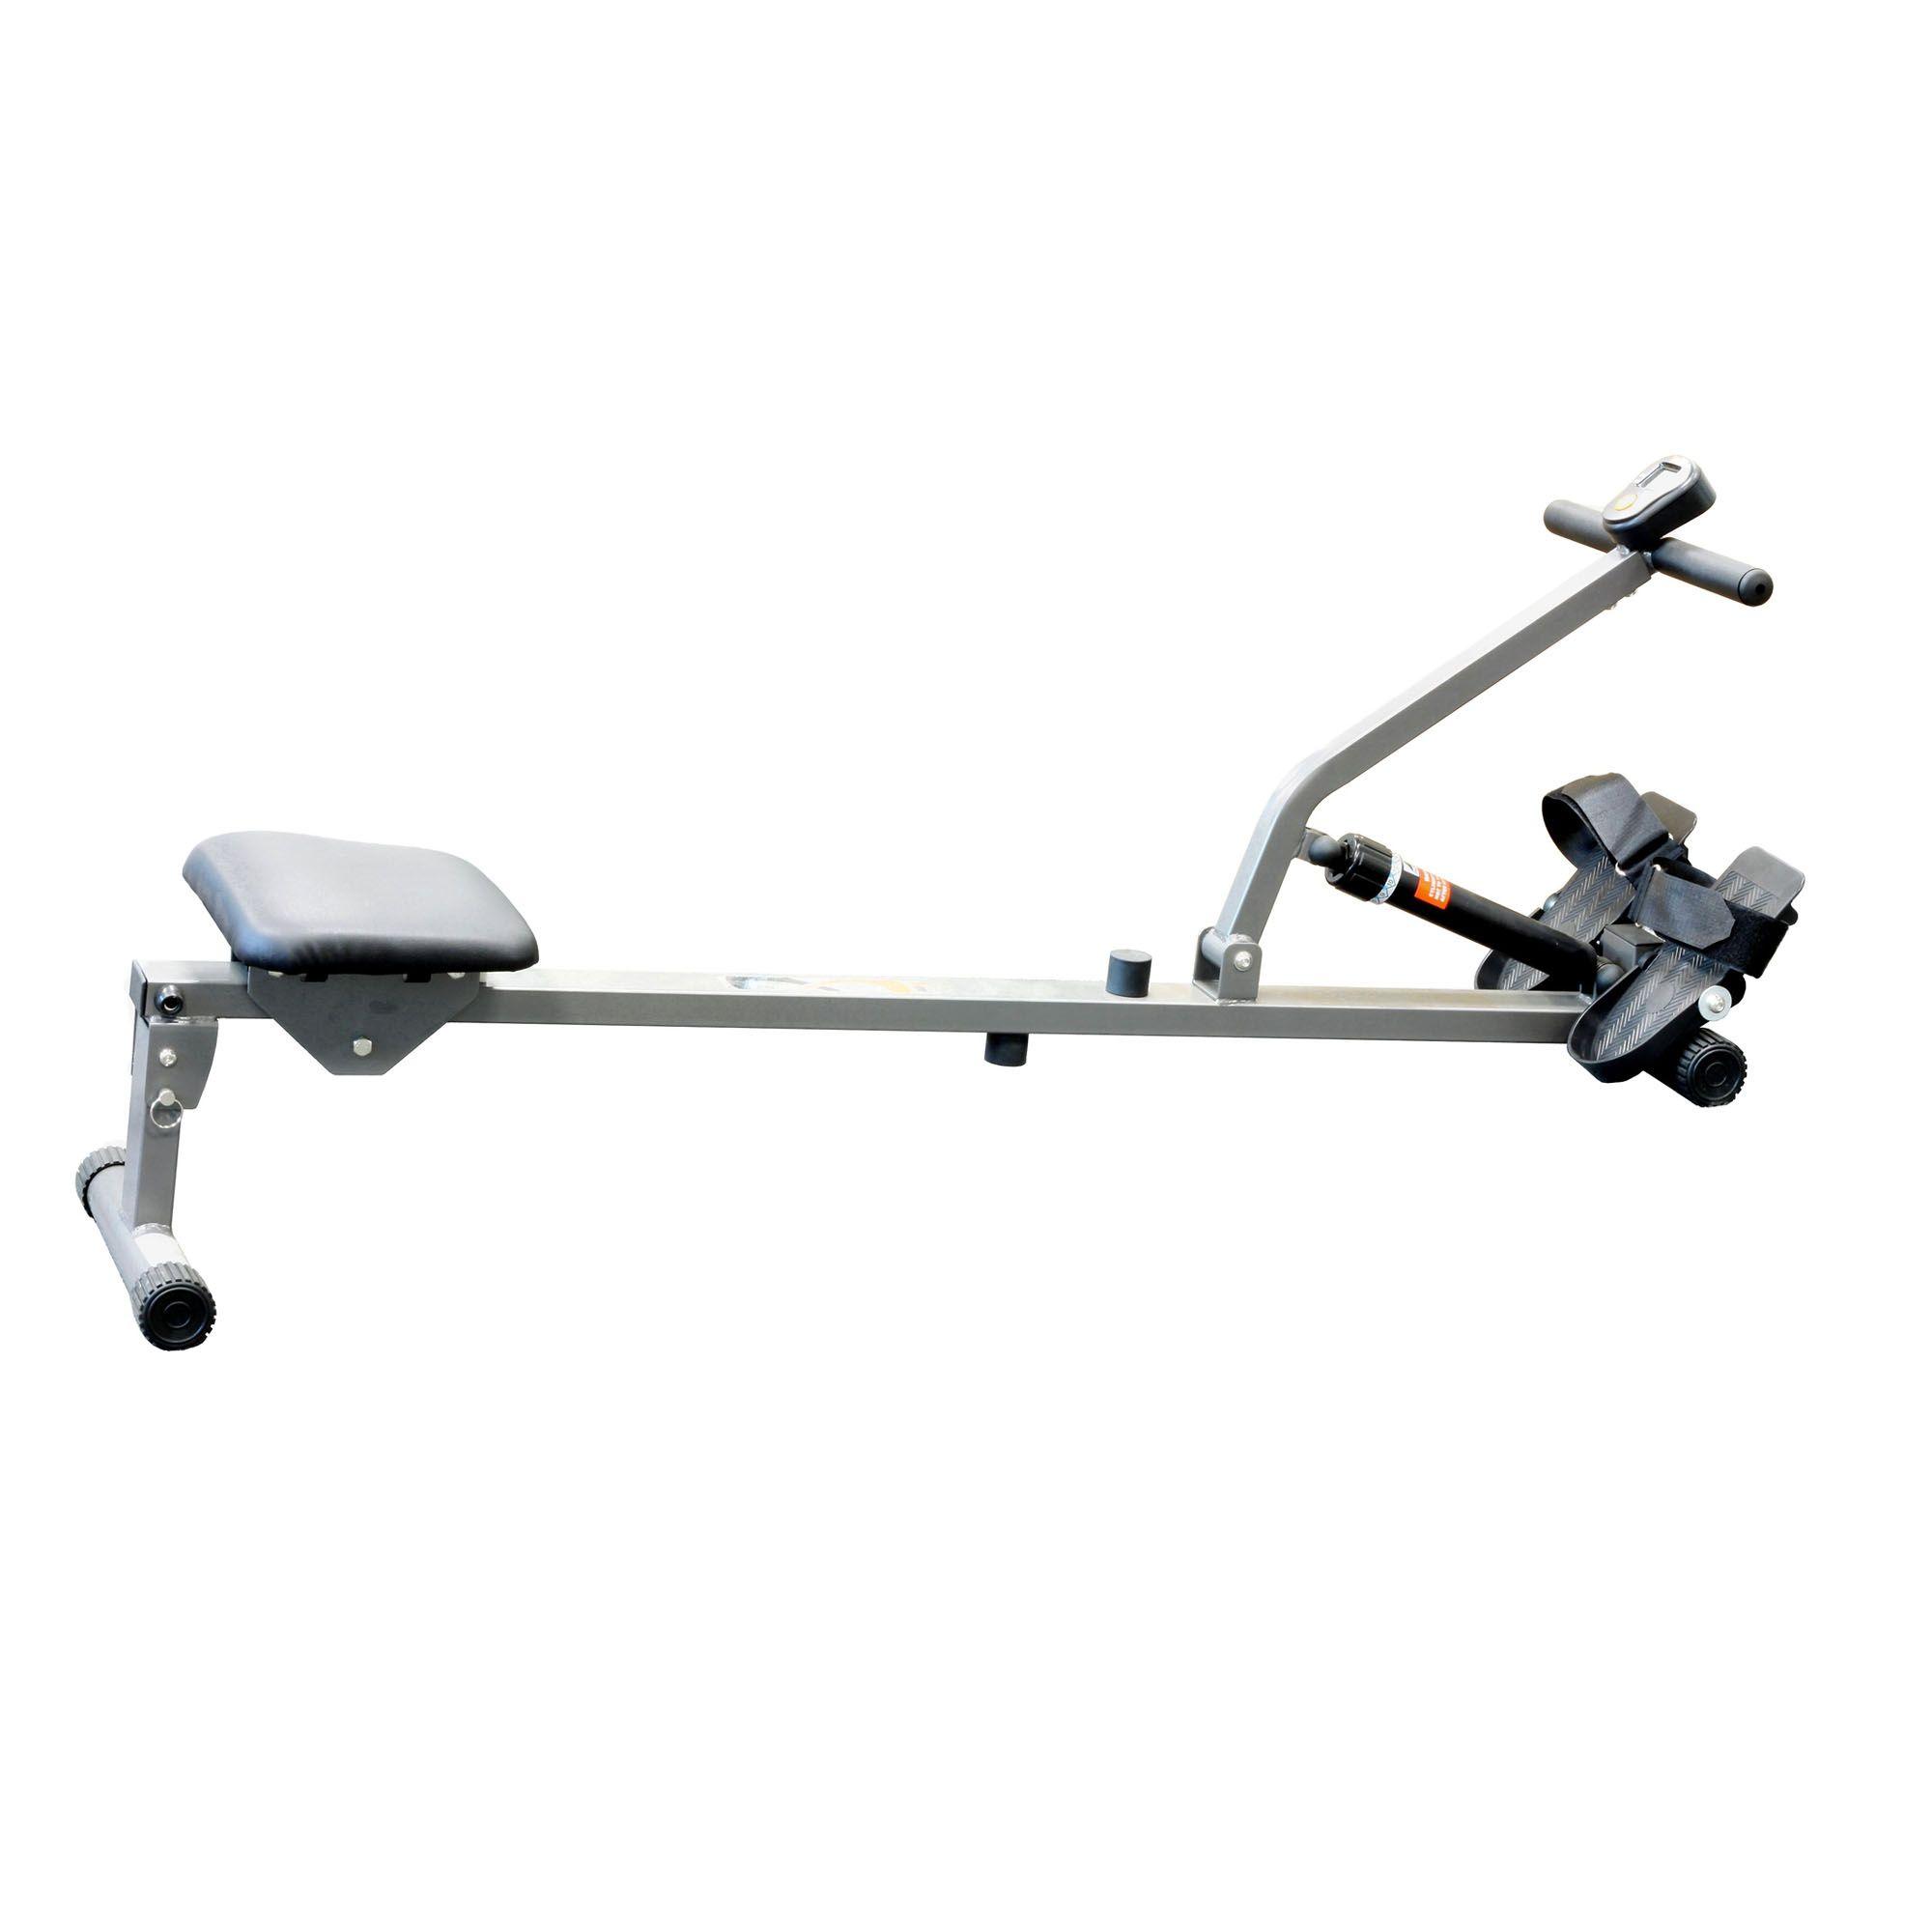 V Fit Fit Start Single Hydraulic Rowing Machine